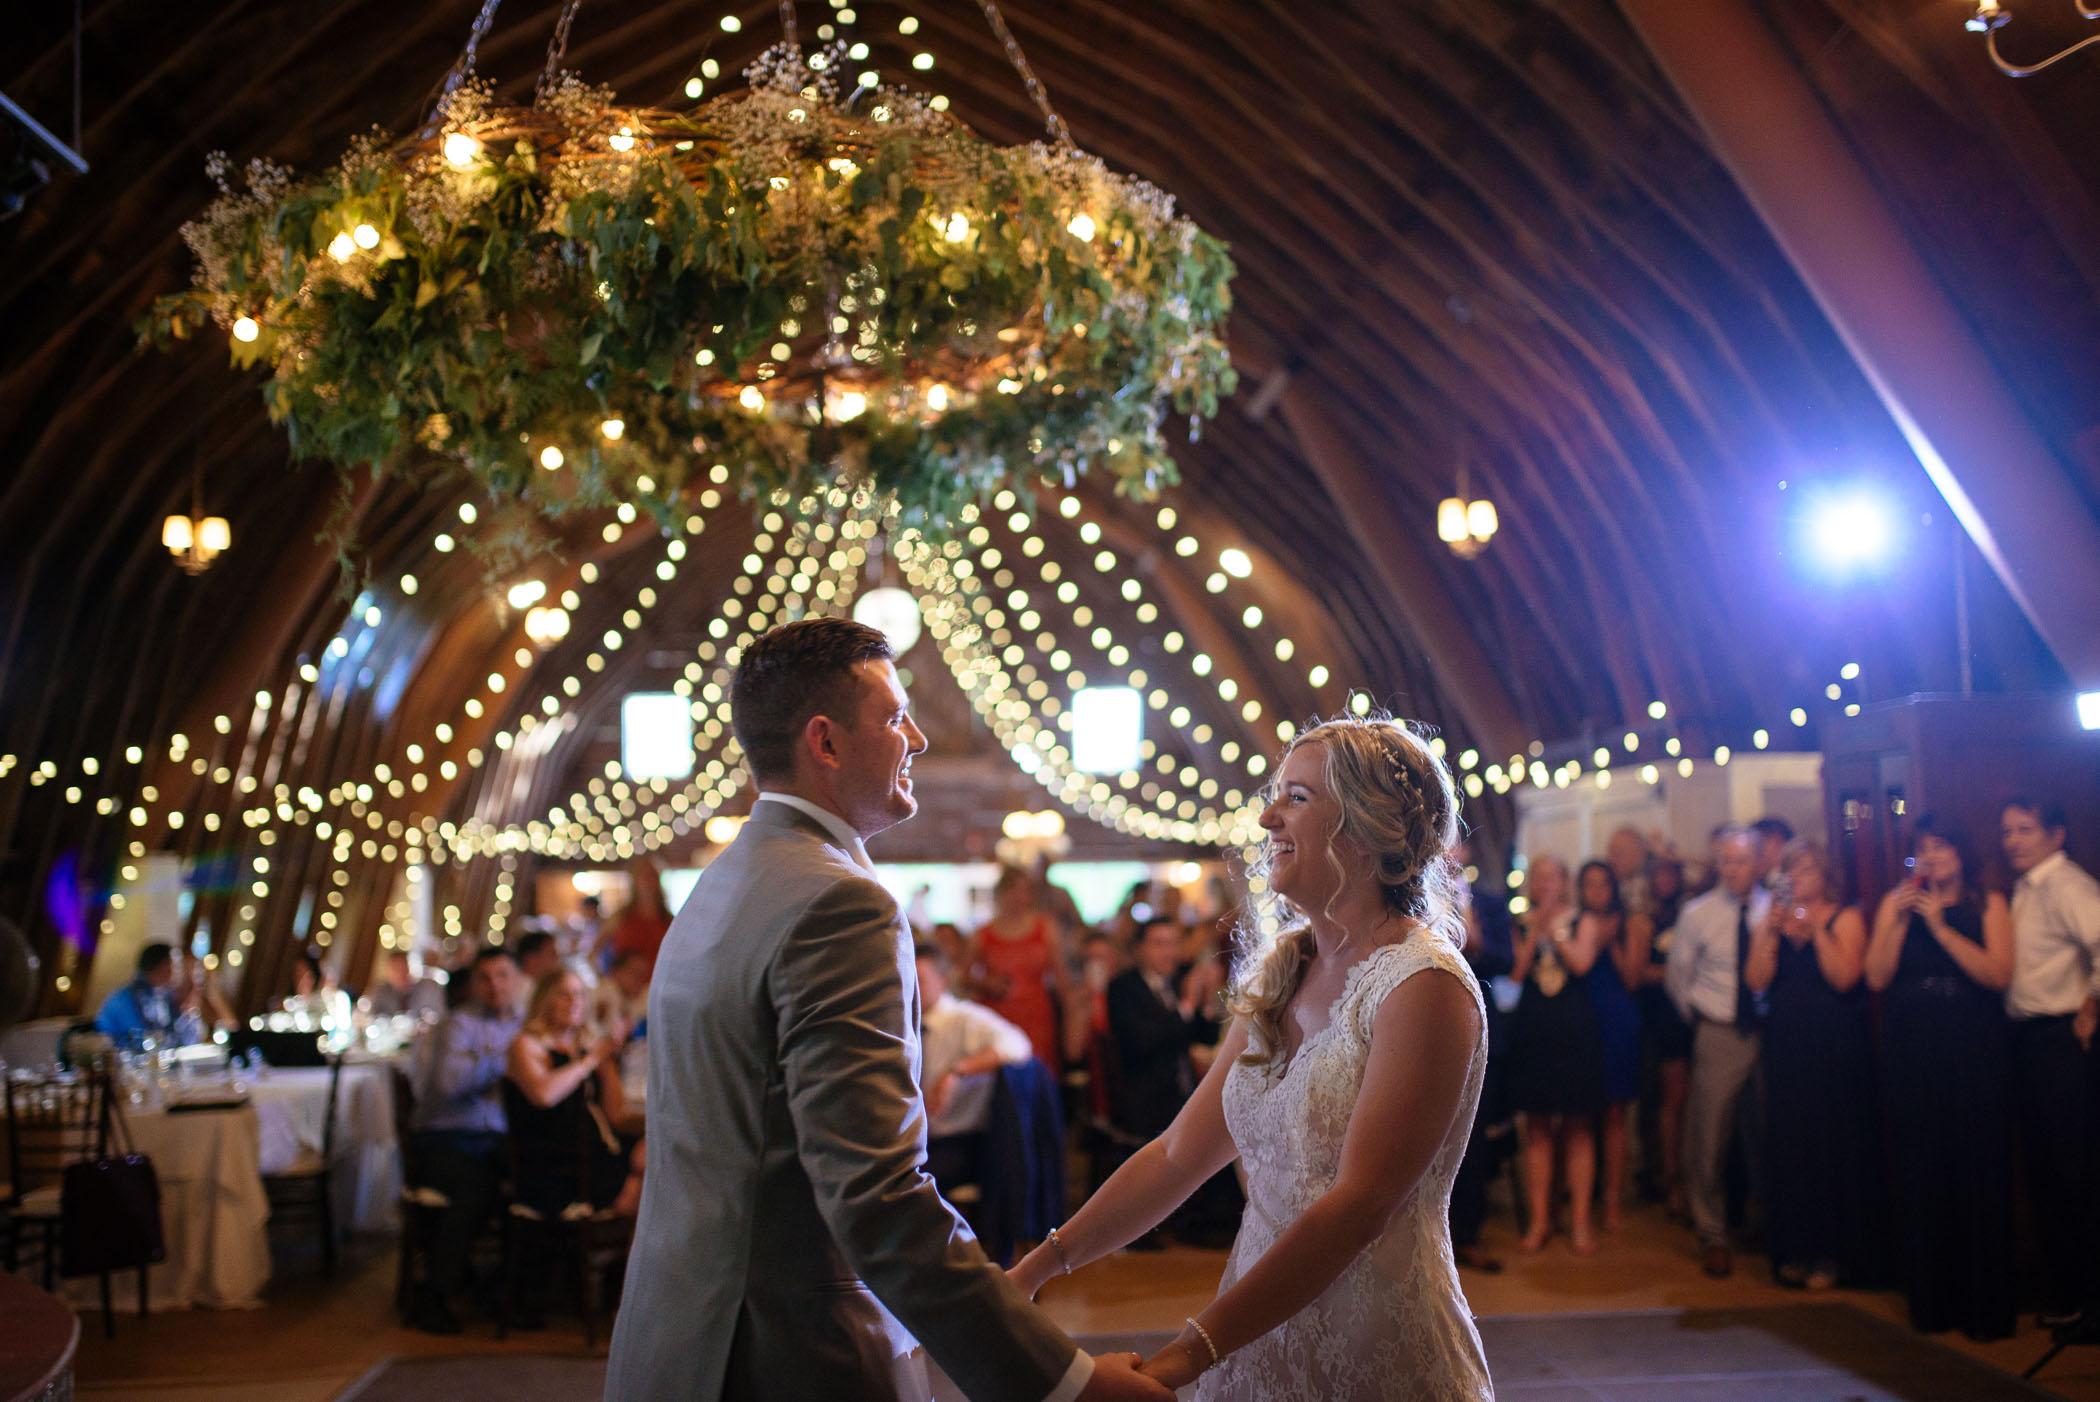 michigan_wedding_at_blue_dress_barn_058.jpg